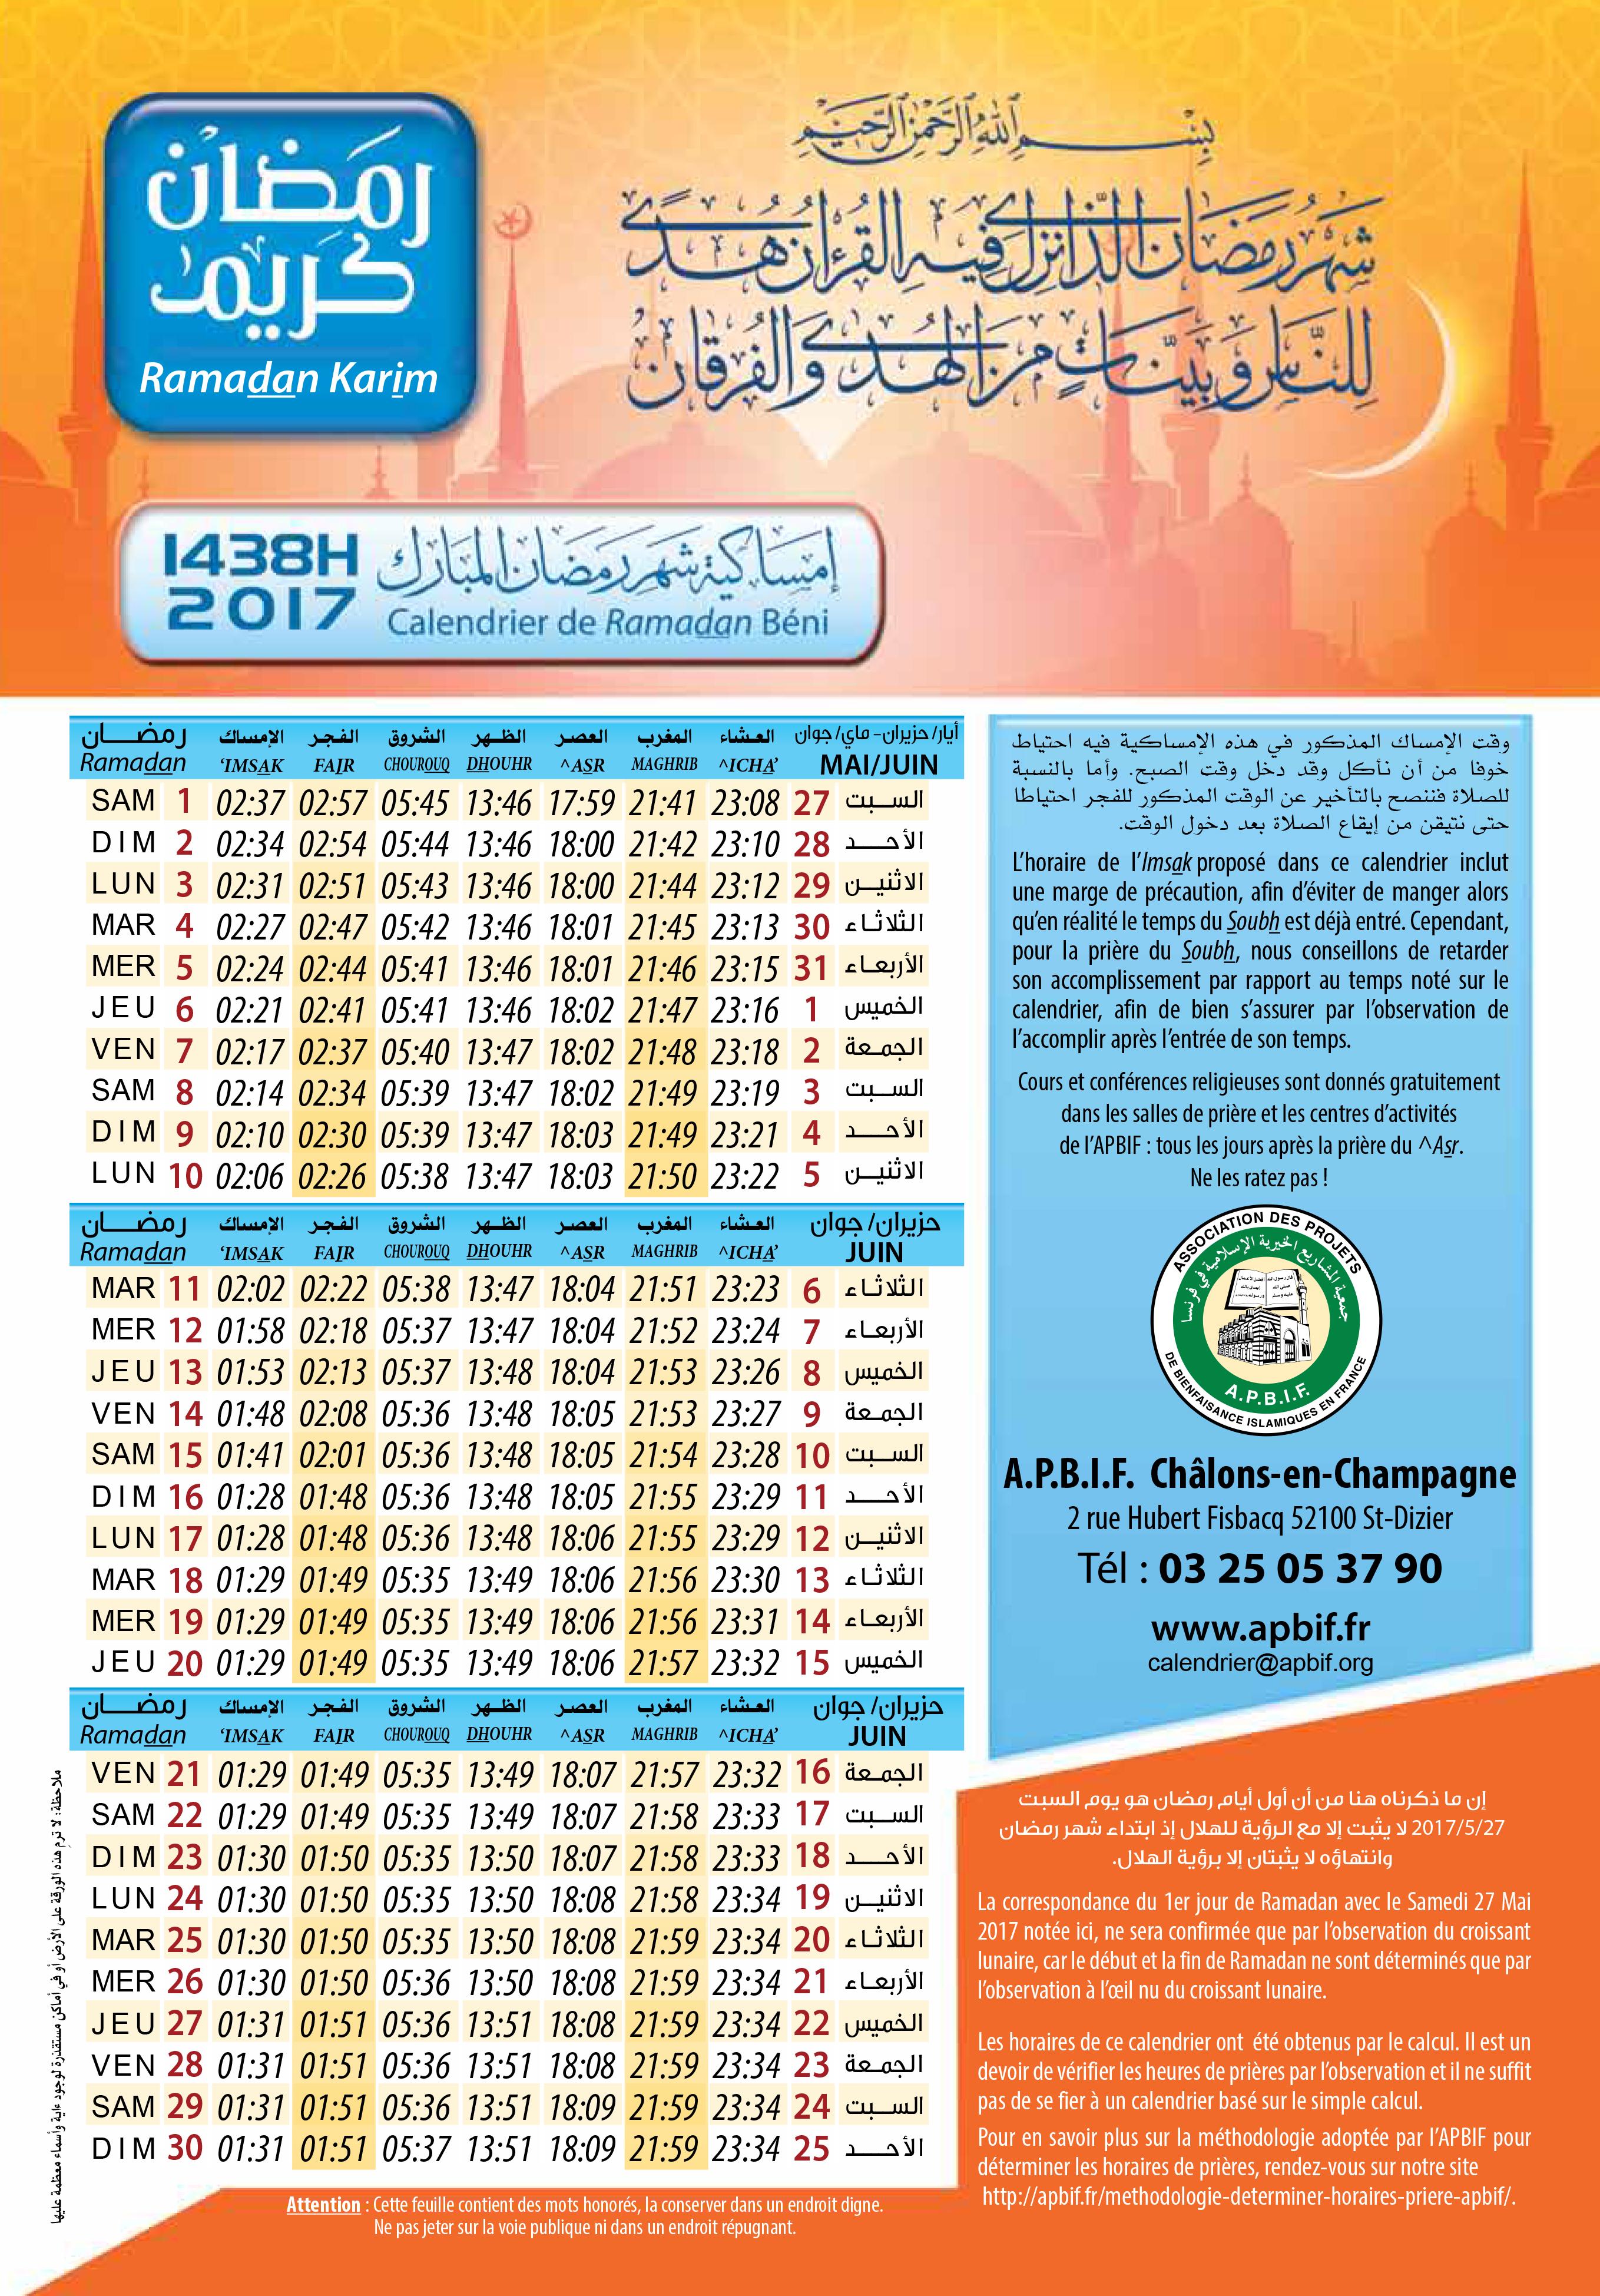 Imsakiyyah Calendrier Ramadan 2017 / 1438H   Association des